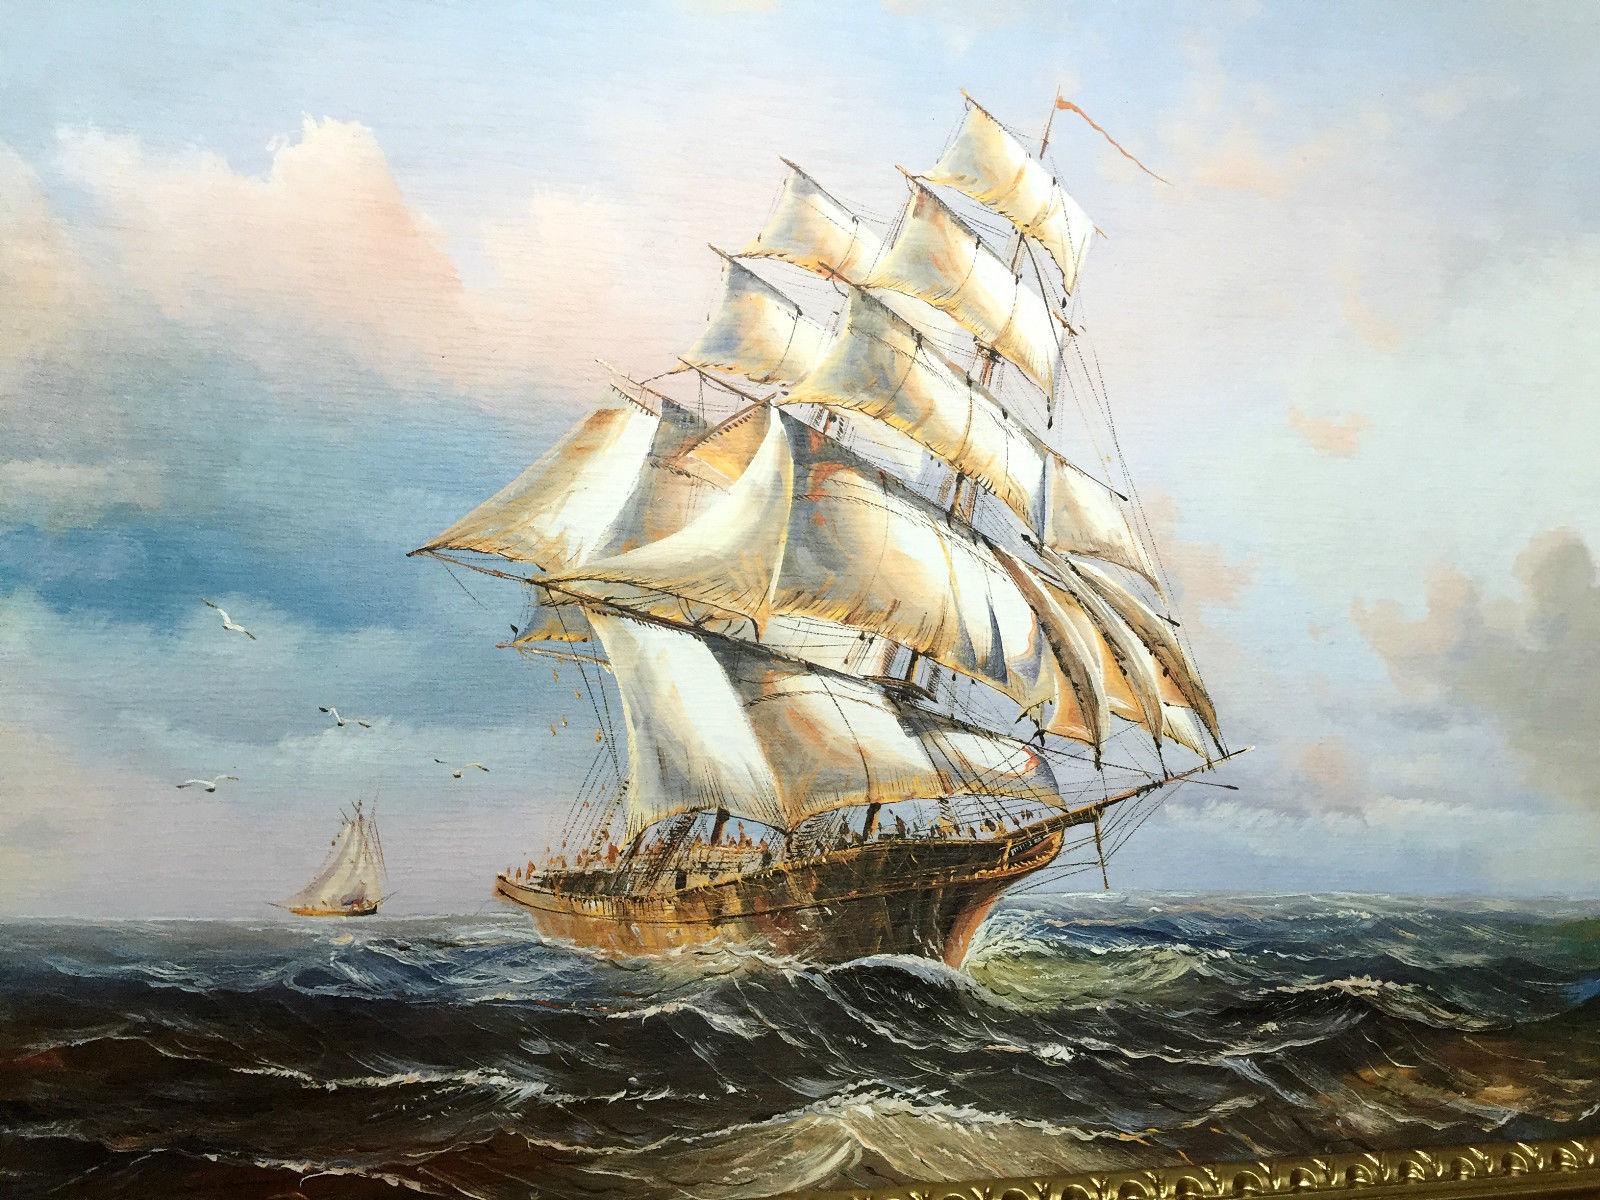 gem lde segelschiff meer schiffsbilder seest ck maritime wei schiffe 90x70 kaufen bei pintici. Black Bedroom Furniture Sets. Home Design Ideas